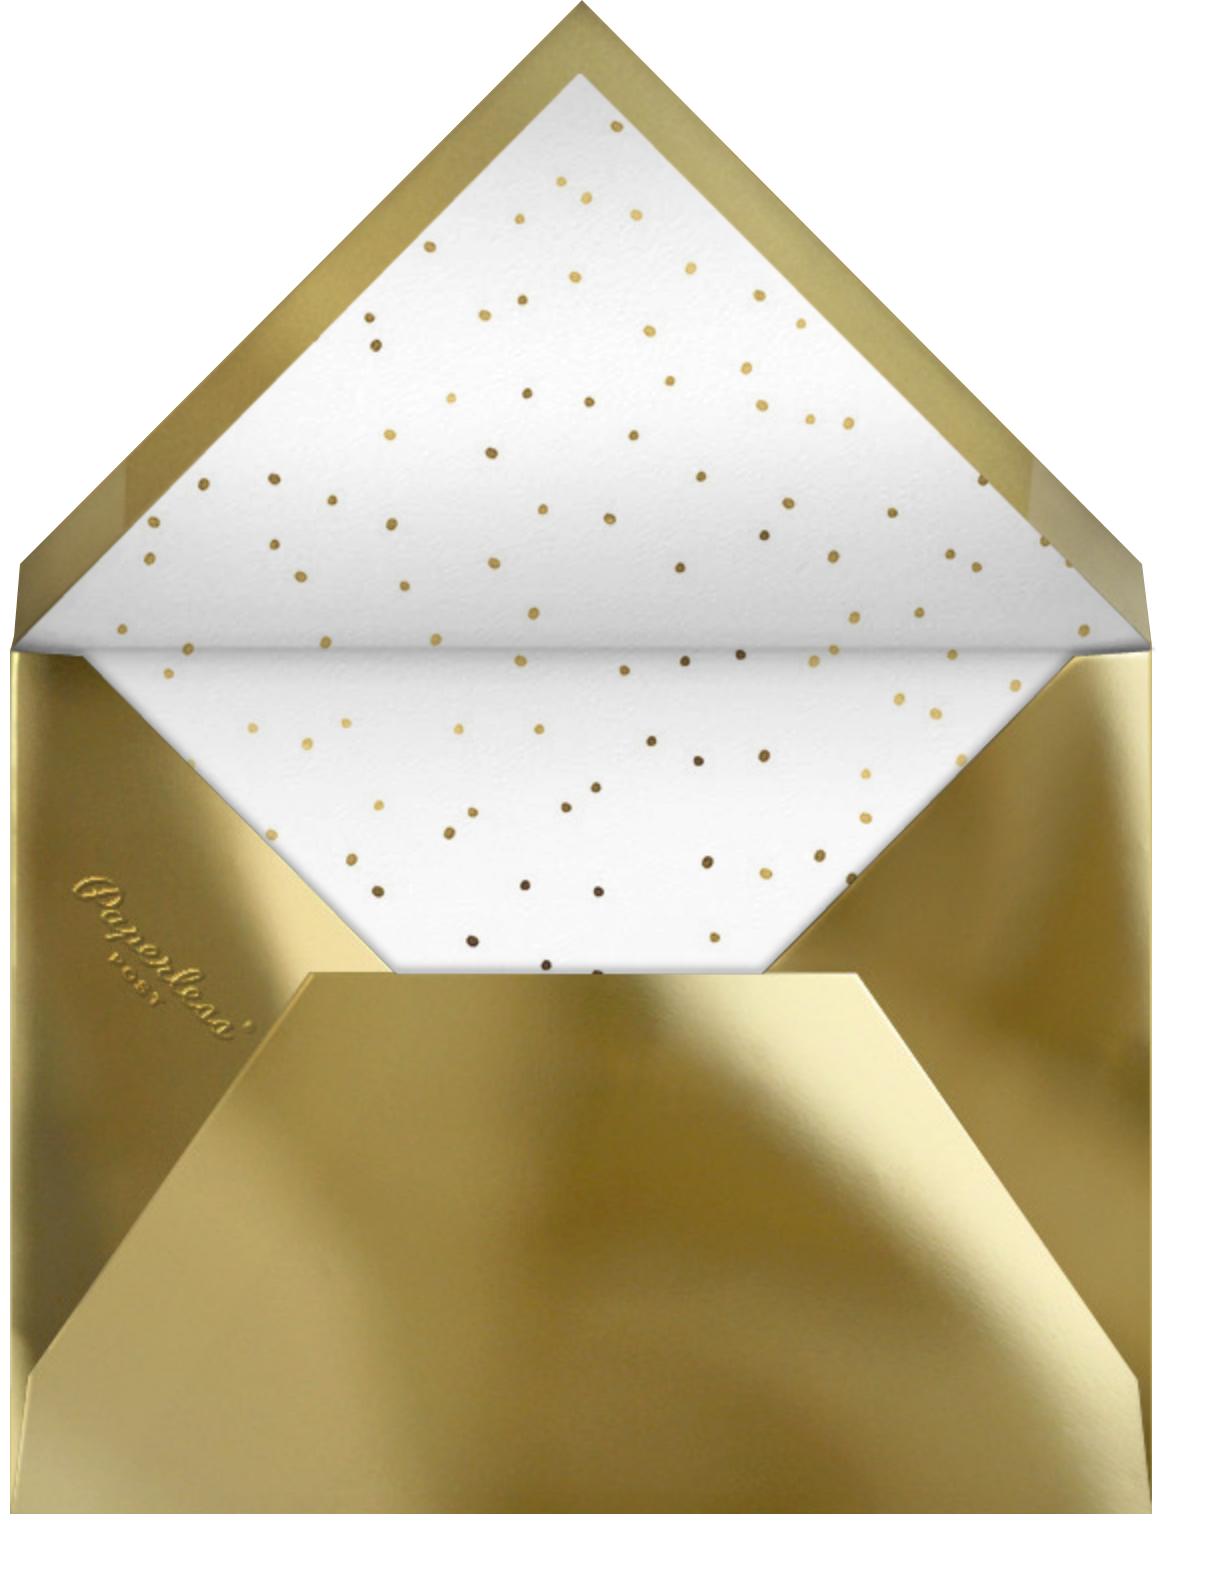 Cursive Christening - Paperless Post - Envelope